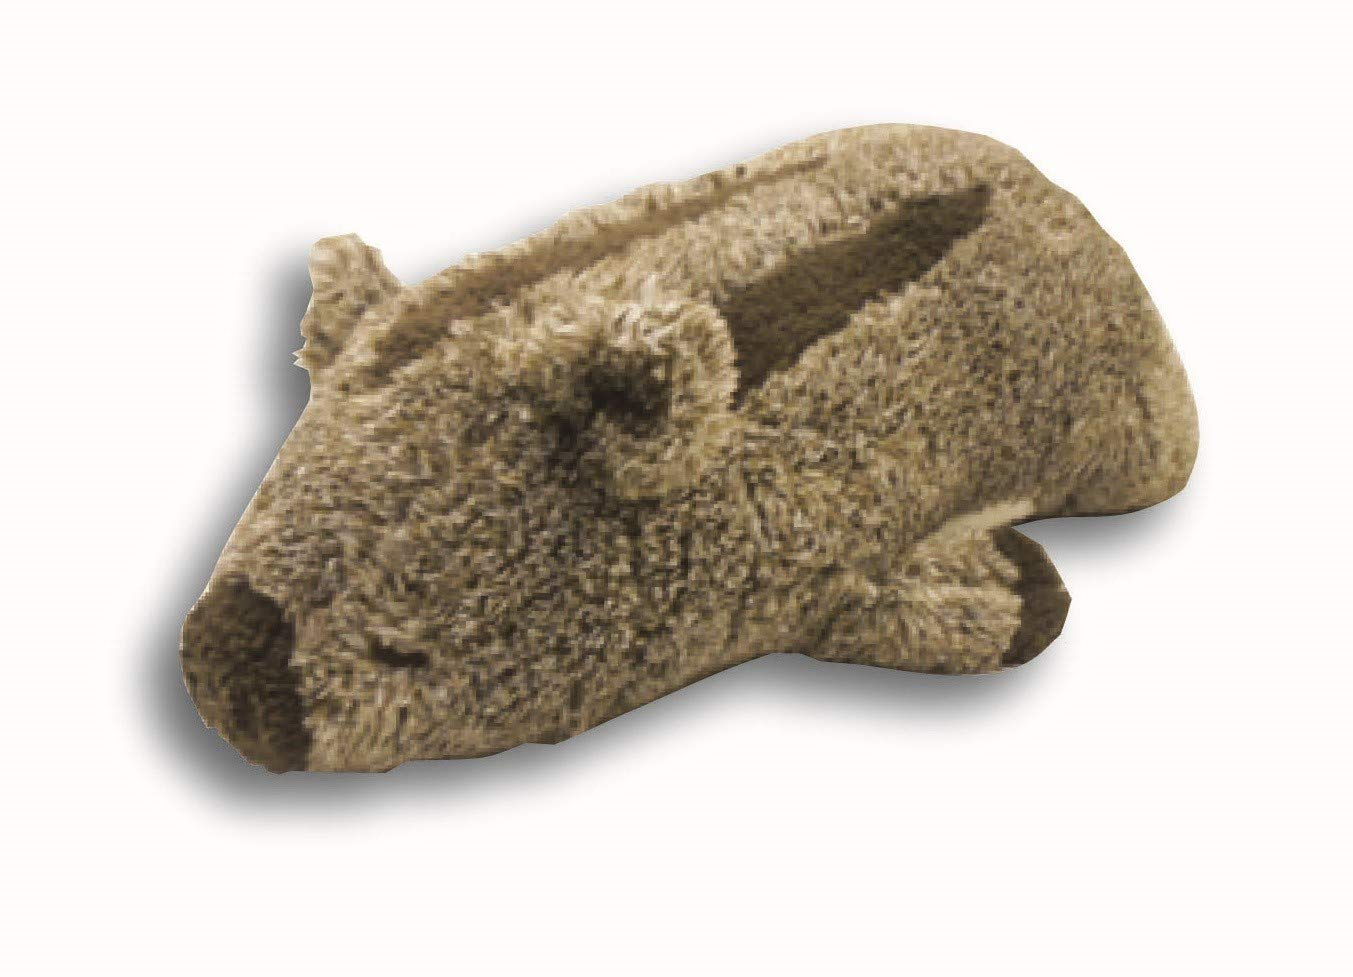 Livheart Wild Boar Fluffy Animals Pillow Plush Famous Dark Brown Inoshishi 'Uriri' Size M (21''x10''x6'') Japan Import 58626-13 Huggable Warm Super Soft Stuffed